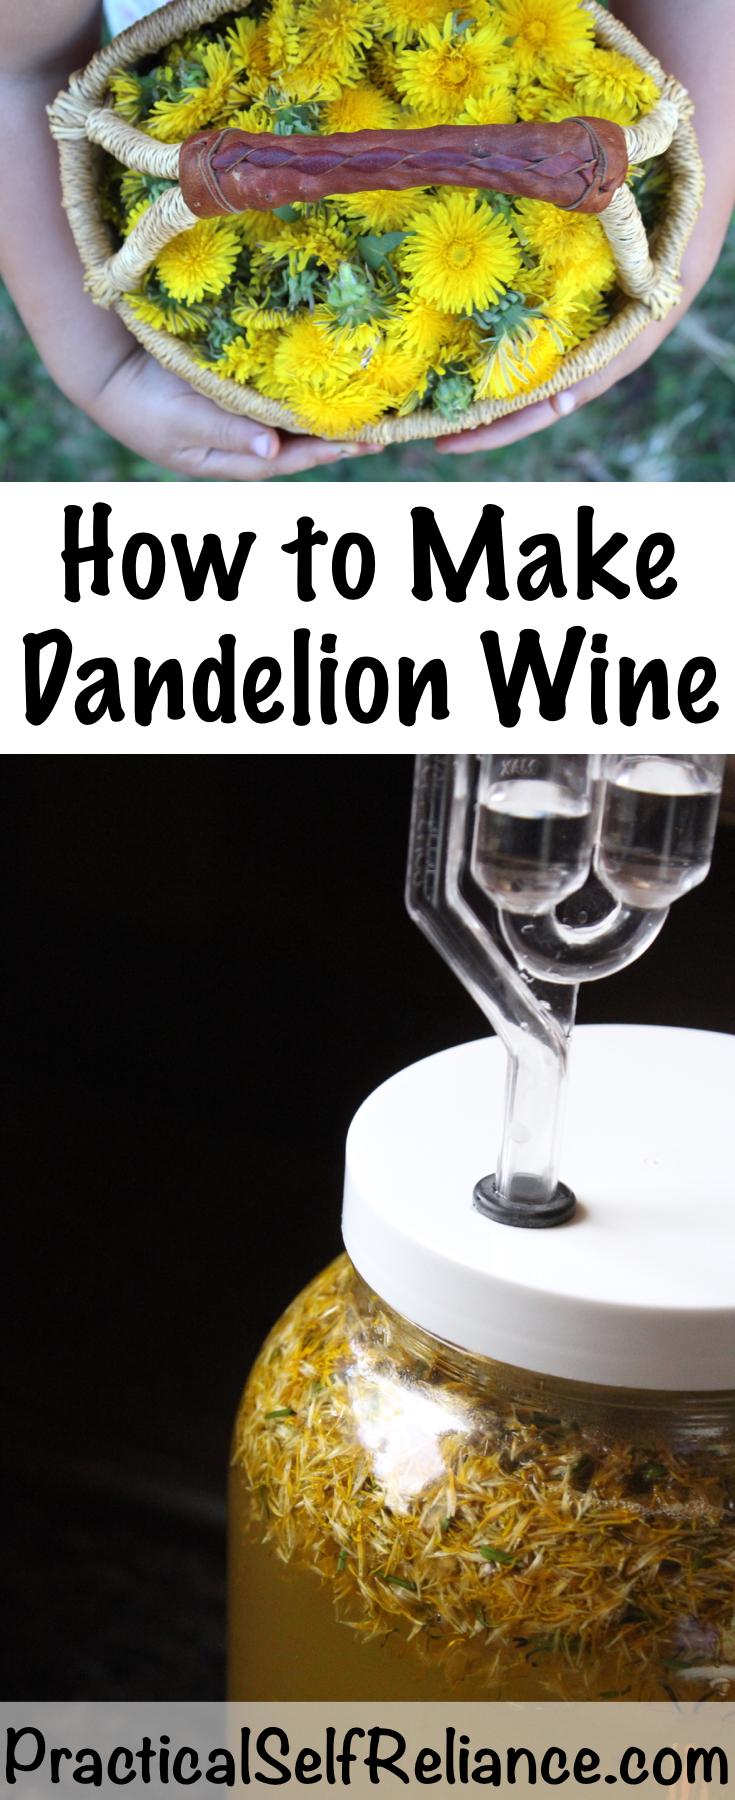 How to Make Dandelion Wine ~ Old Fashioned Dandelion Wine Recipe